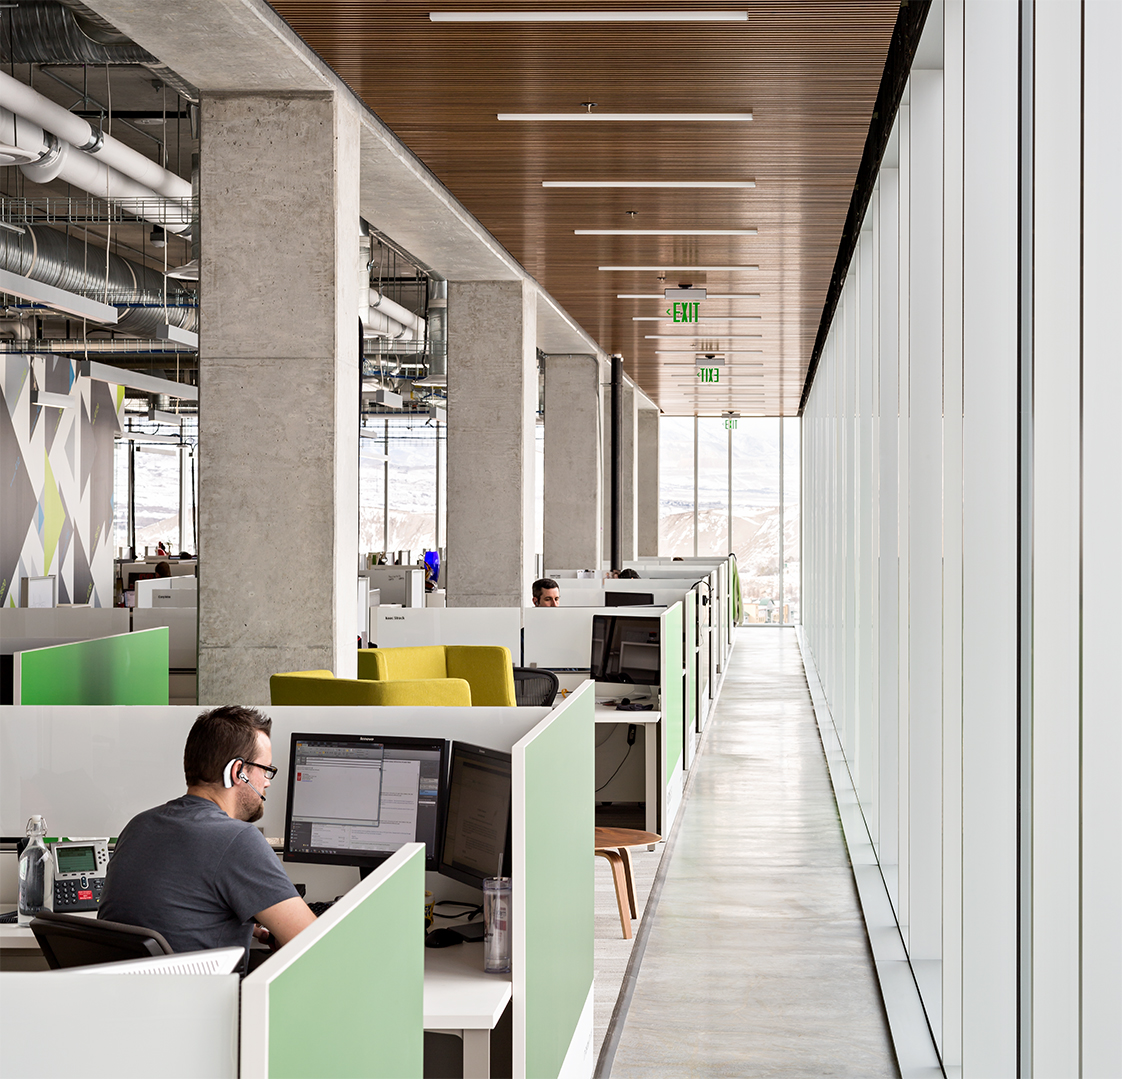 Adobe Utah workstations